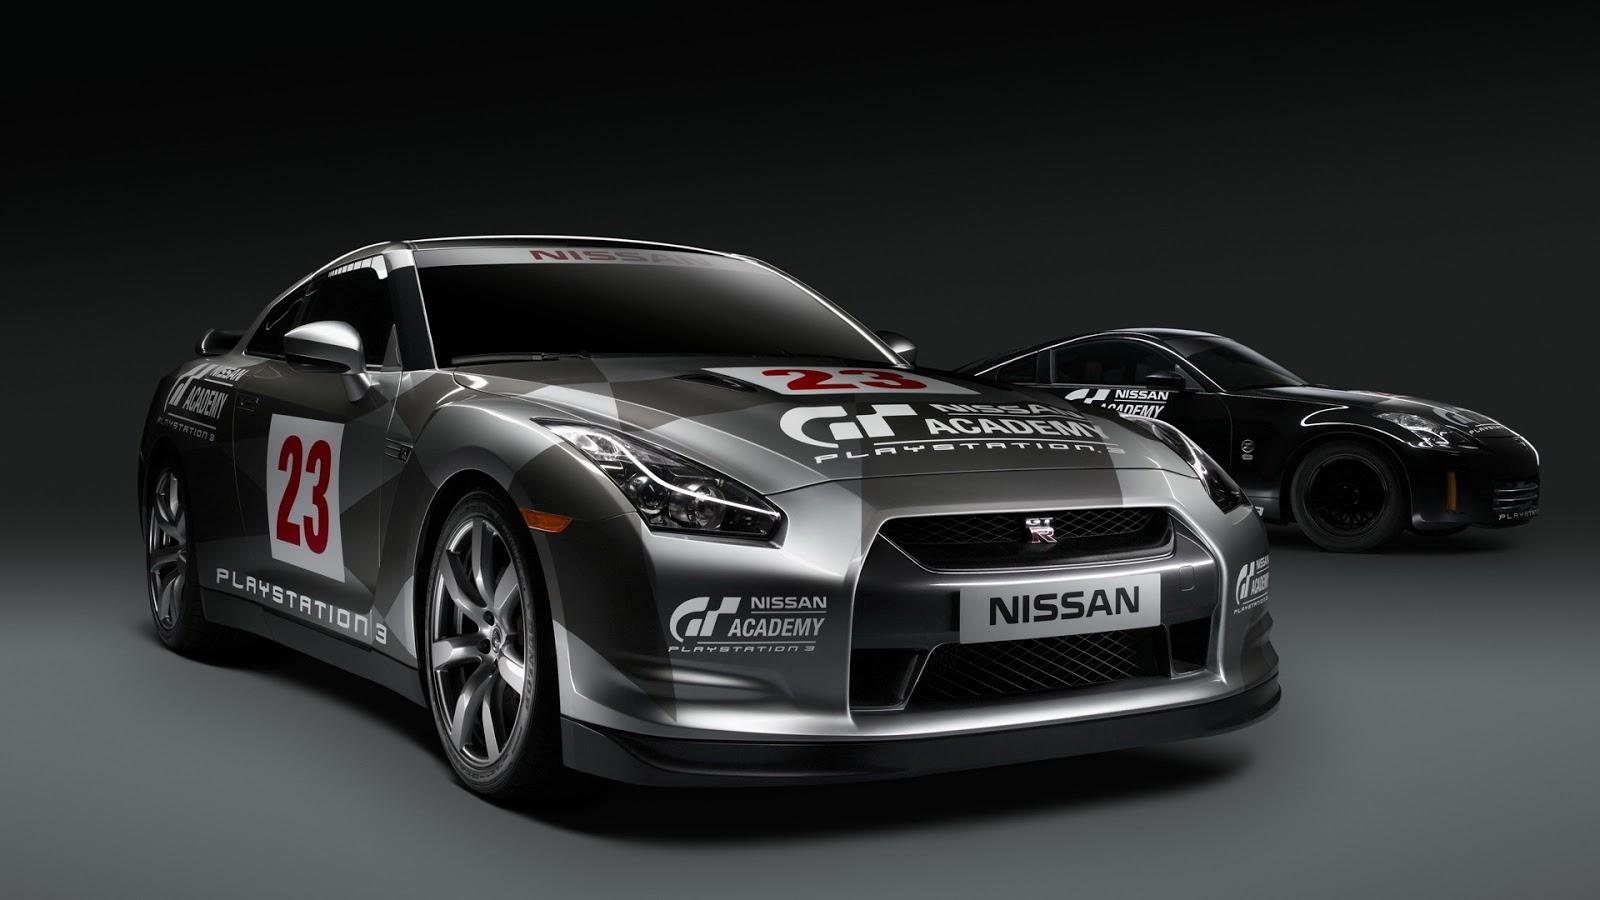 http://1.bp.blogspot.com/-5g4Z1C-Y3h0/UO-NDQyKPZI/AAAAAAAAyO8/srJrjXxchpY/s1600/Nissan-Skyline-R35-GT-R_Fondos-de-Pantalla-de-Carros-Deportivos.jpg